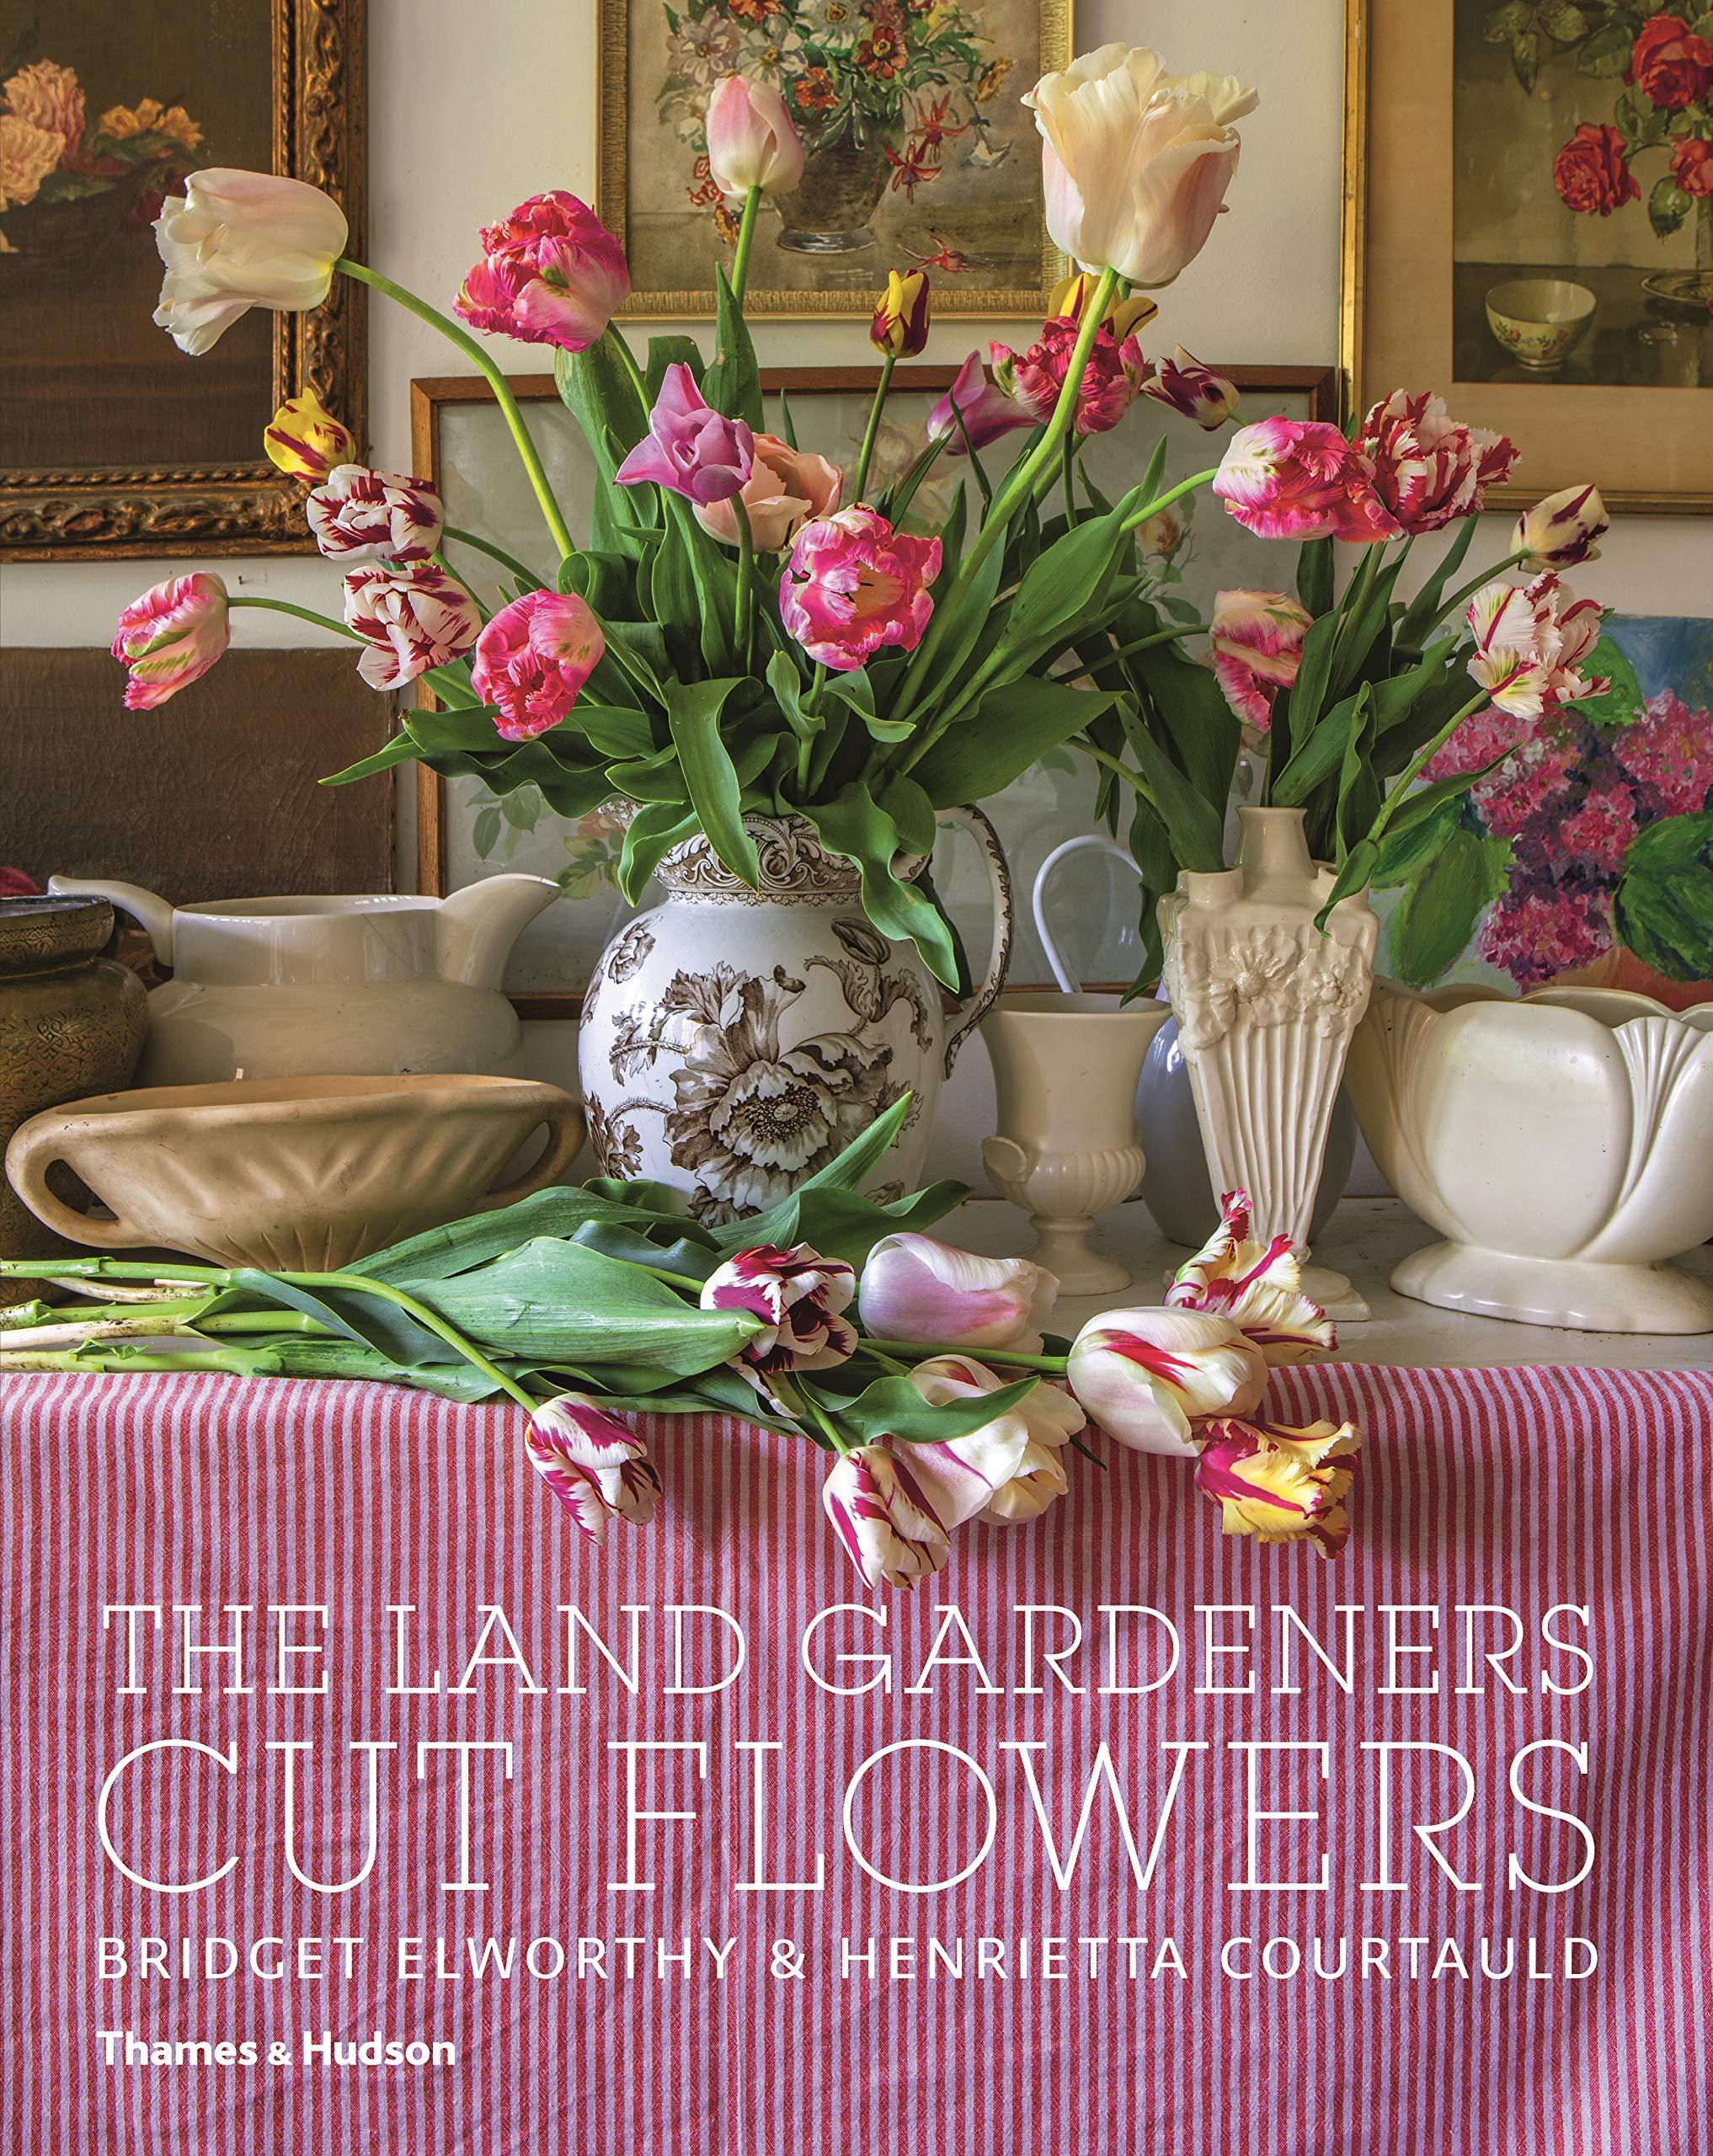 The Land Gardeners  Cut Flowers